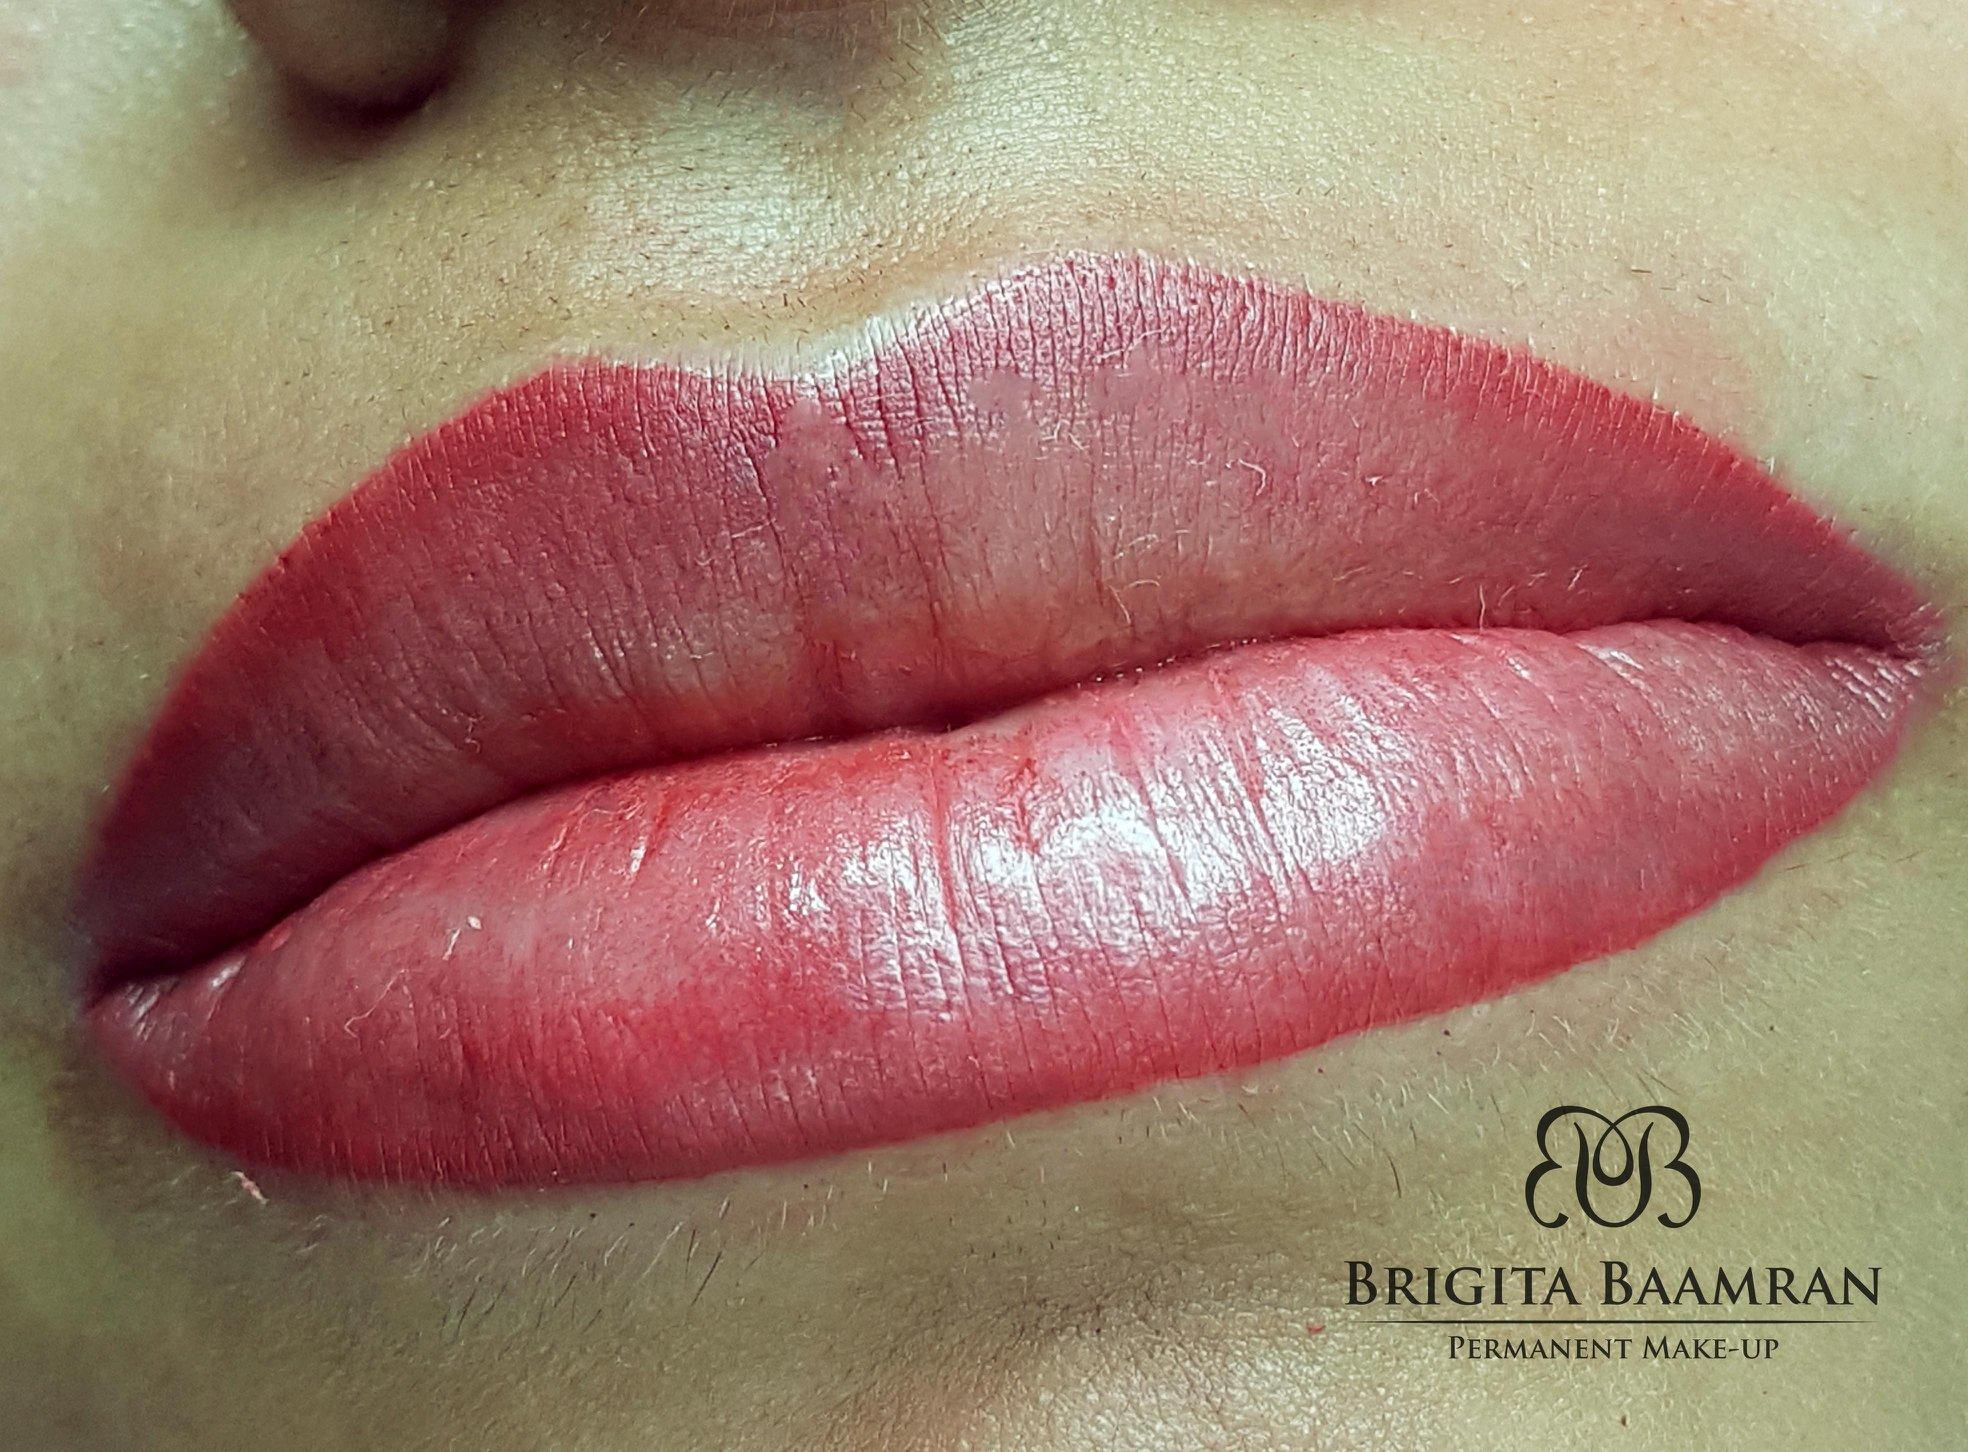 TREATMENTS | Brigita Baamran Nanoblading & SPMU